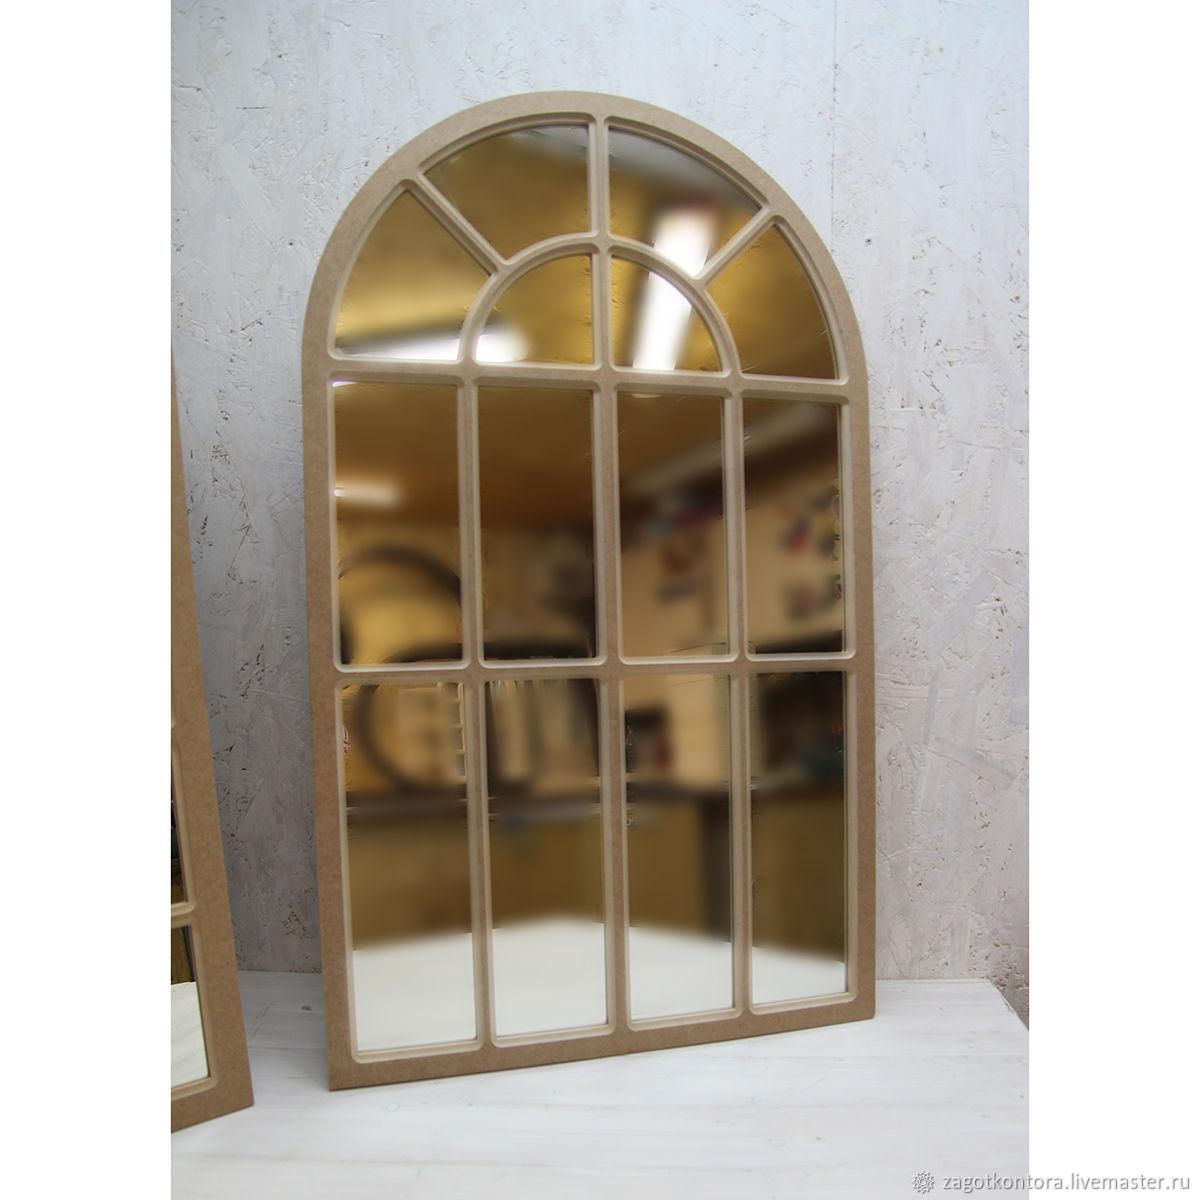 Рама арочная с переплётом для зеркала, Зеркала, Москва,  Фото №1